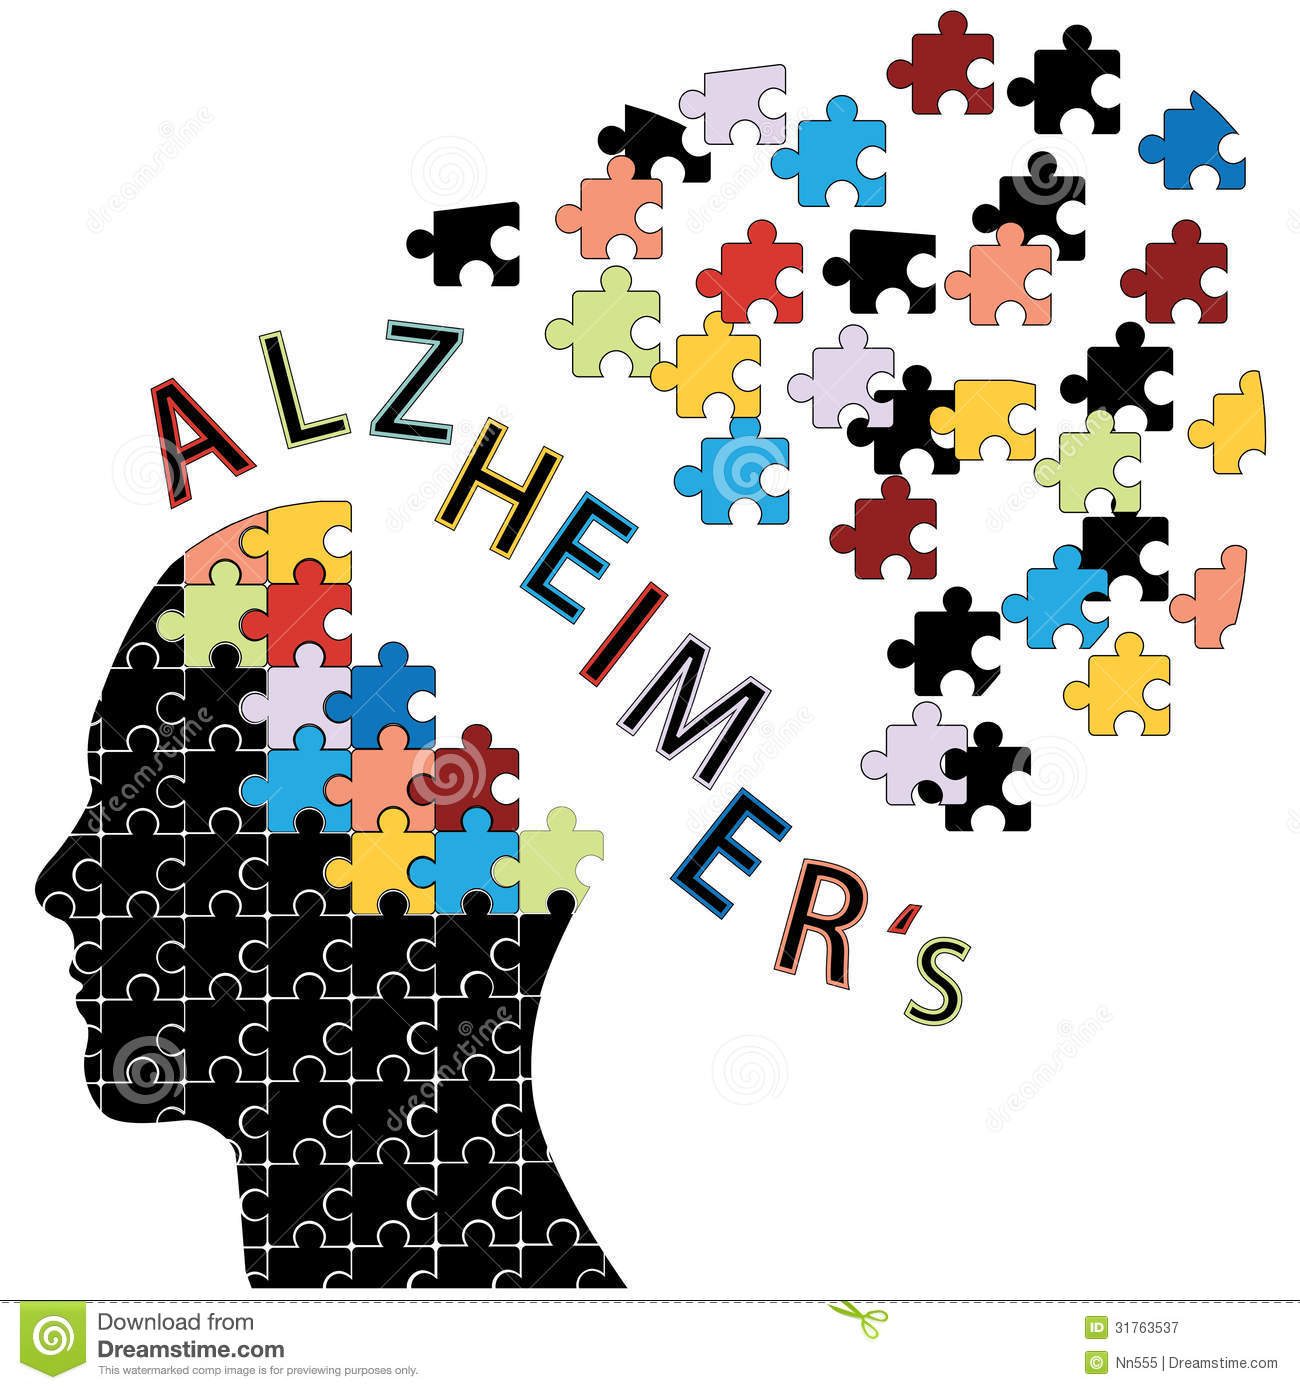 Alzheimers clipart 8 » Clipart Station.